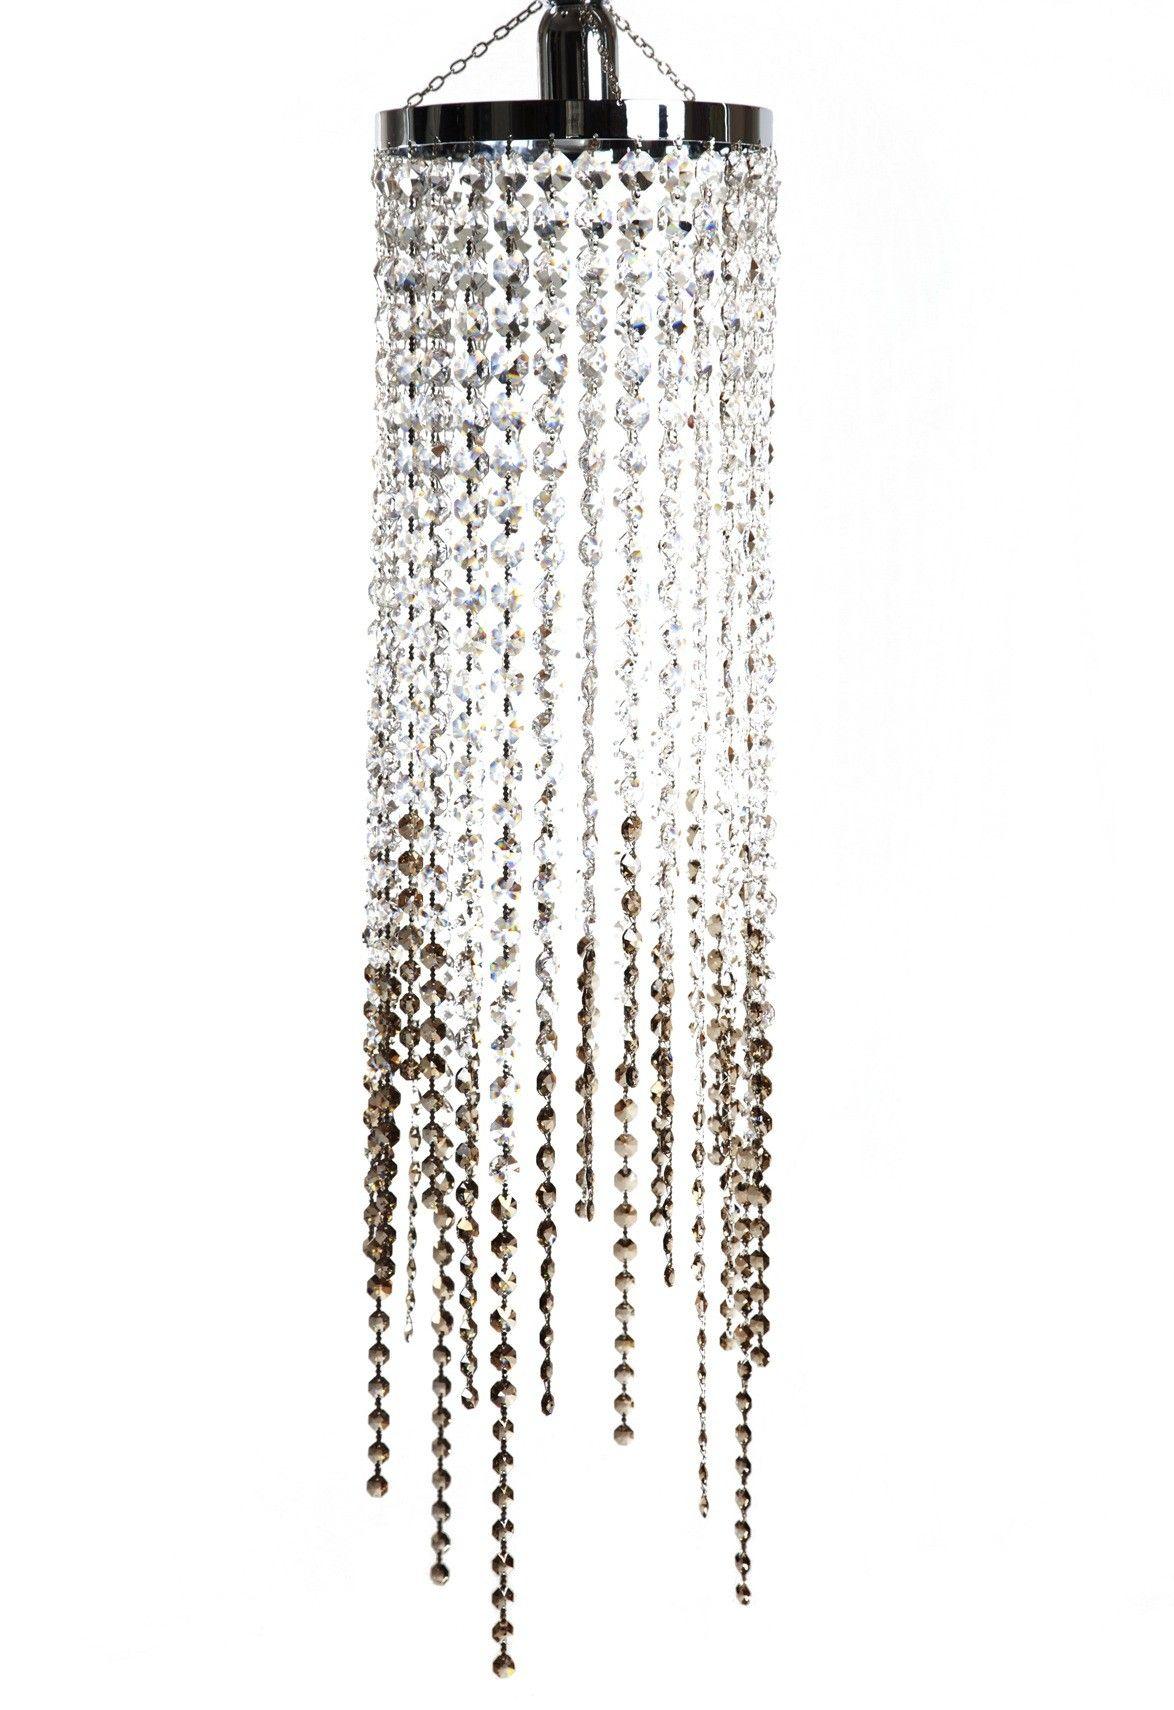 Chandeliers chandelier with smoked crystal detailing chandelier with smoked crystal detailing chandeliers lighting aloadofball Images